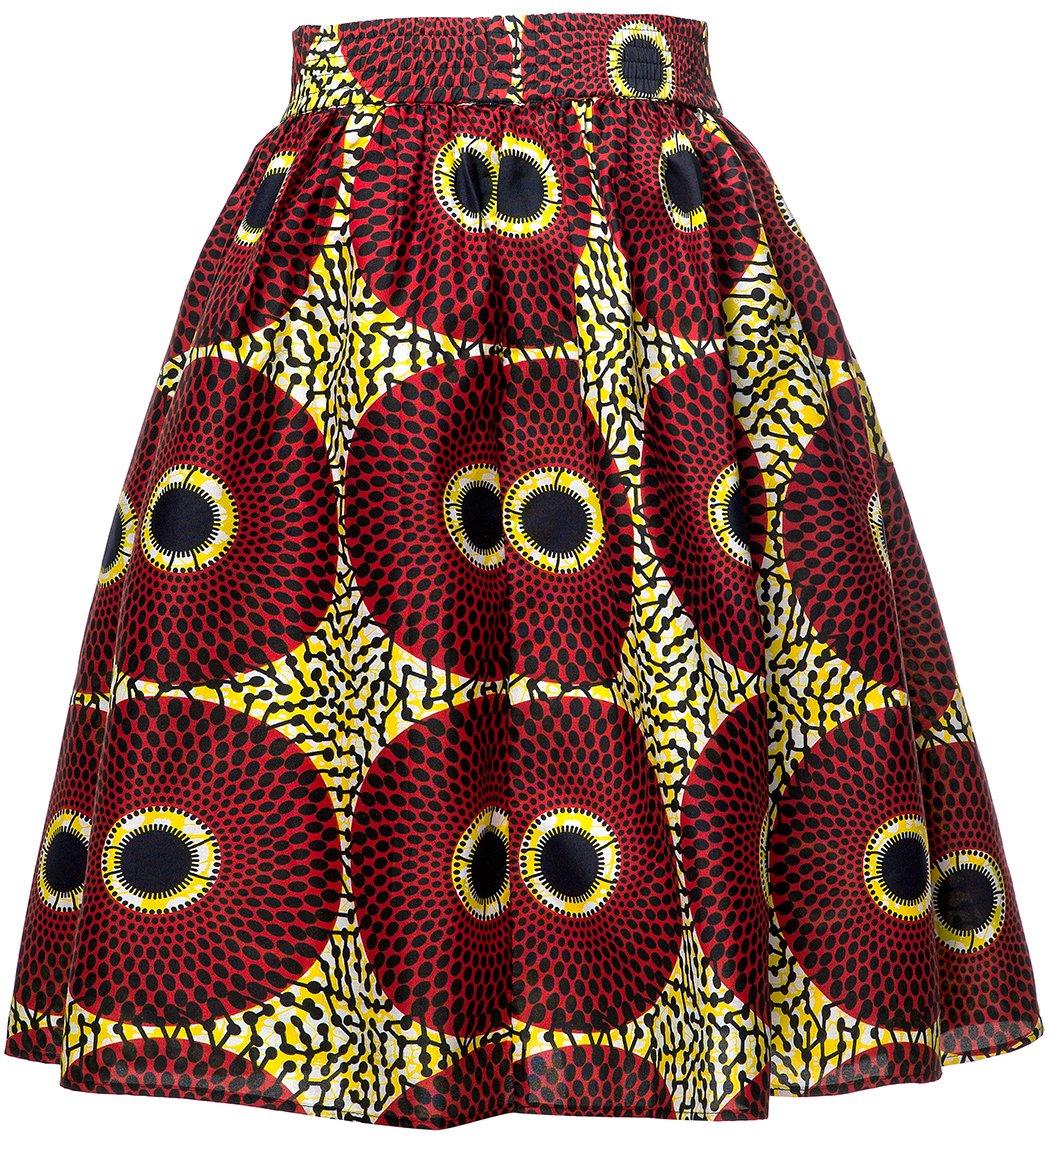 Shenbolen Women African Traditional Costume Flower Print Casual Dashiki Skirt (X-Large, E) by Shenbolen (Image #2)